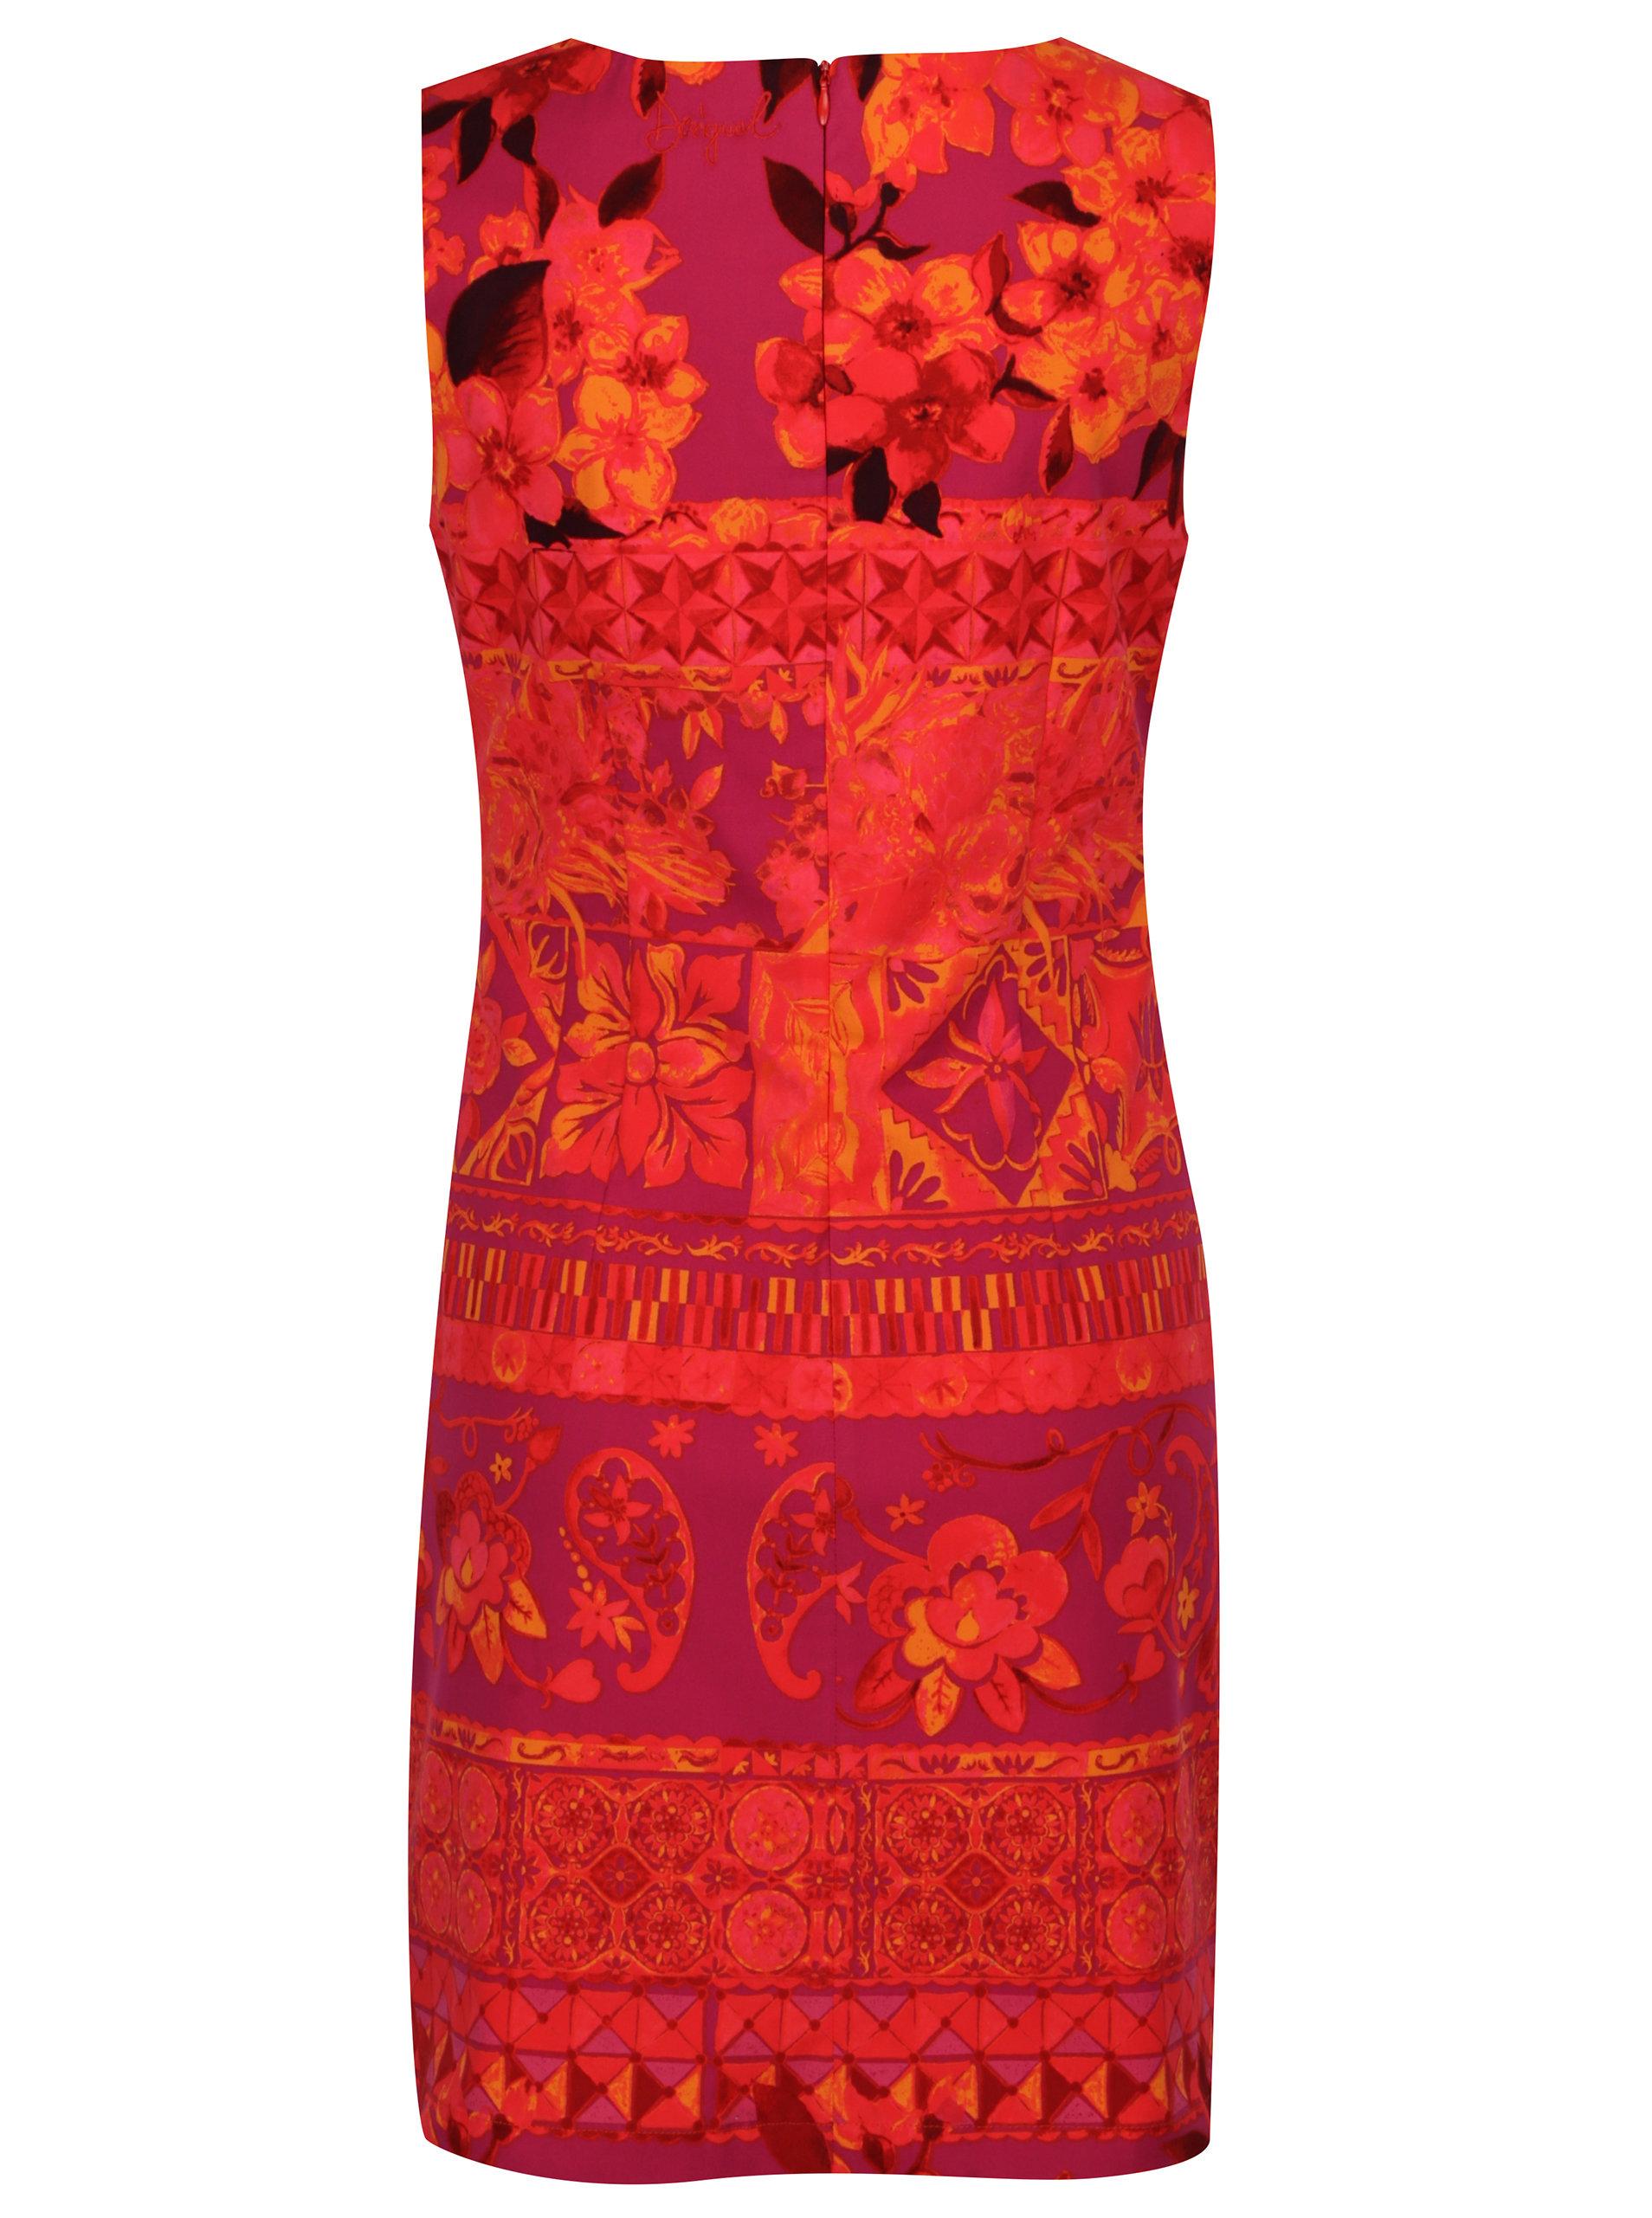 Fialovo-oranžové šaty Desigual Angelina ... 74070a8cf2a